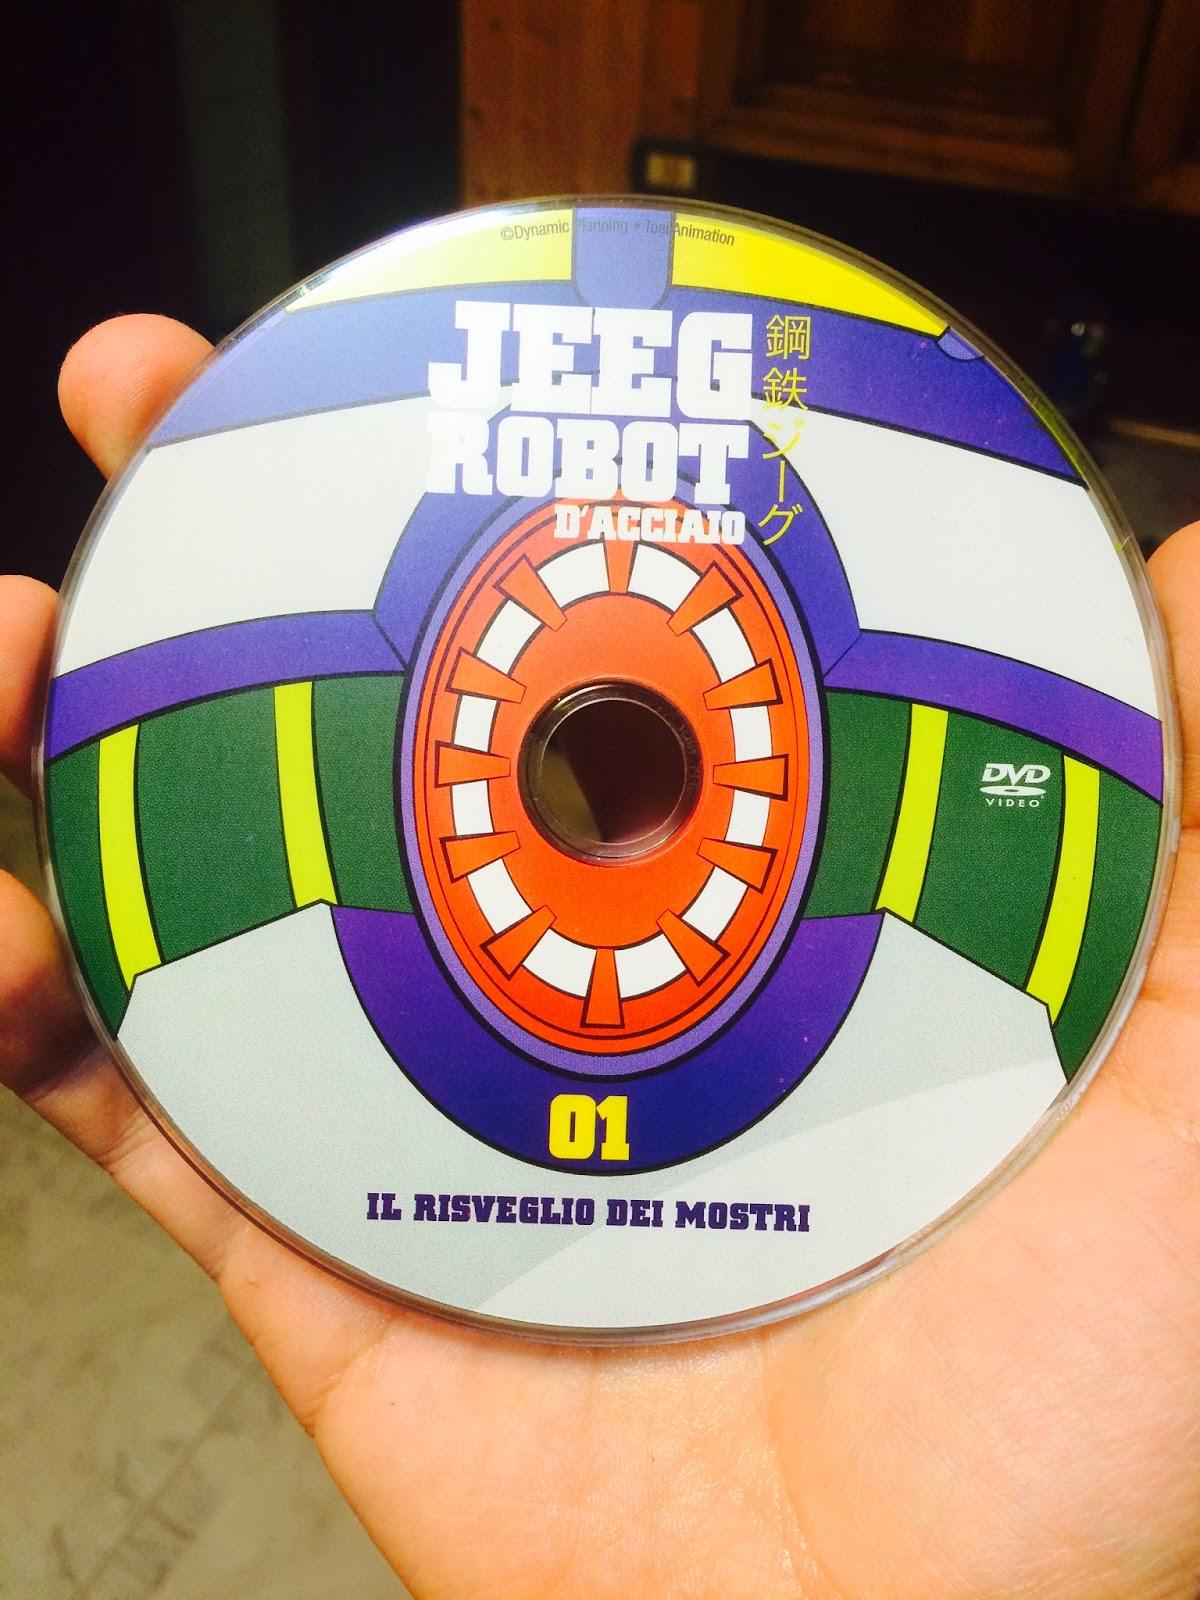 Darkarynland i dvd di jeeg robot in edicola